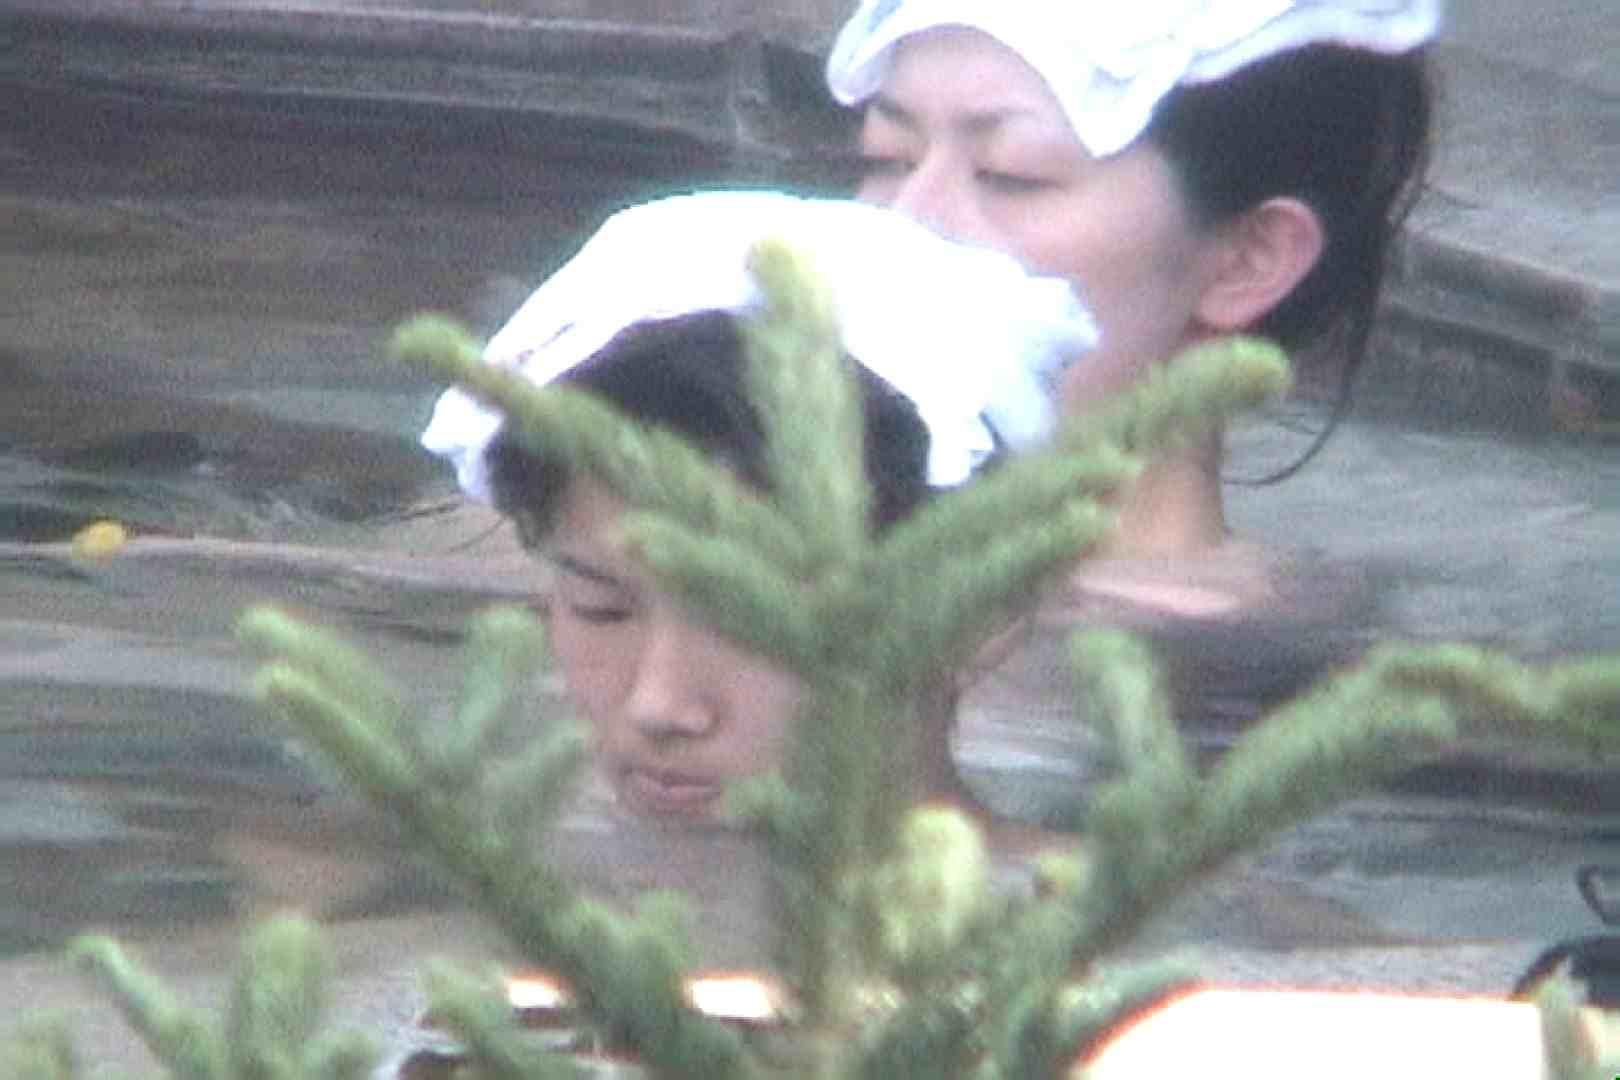 Aquaな露天風呂Vol.80【VIP限定】 盗撮 | HなOL  66pic 32